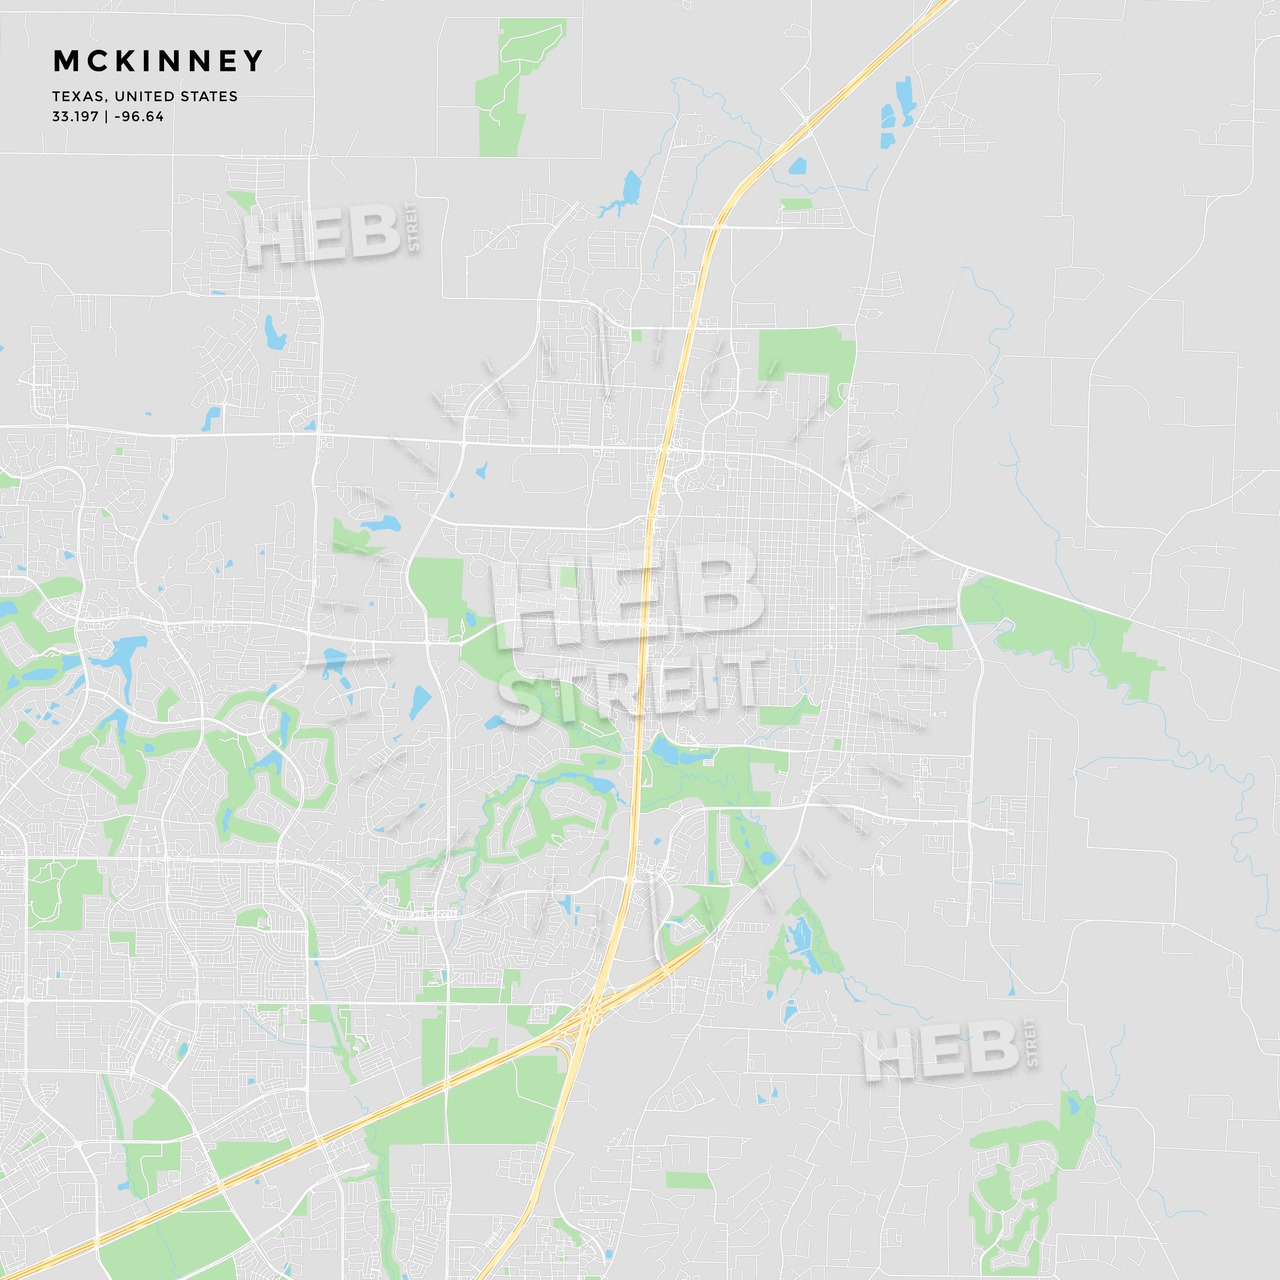 Printable Street Map Of Mckinney, Texas | Hebstreits Sketches - Street Map Of Mckinney Texas